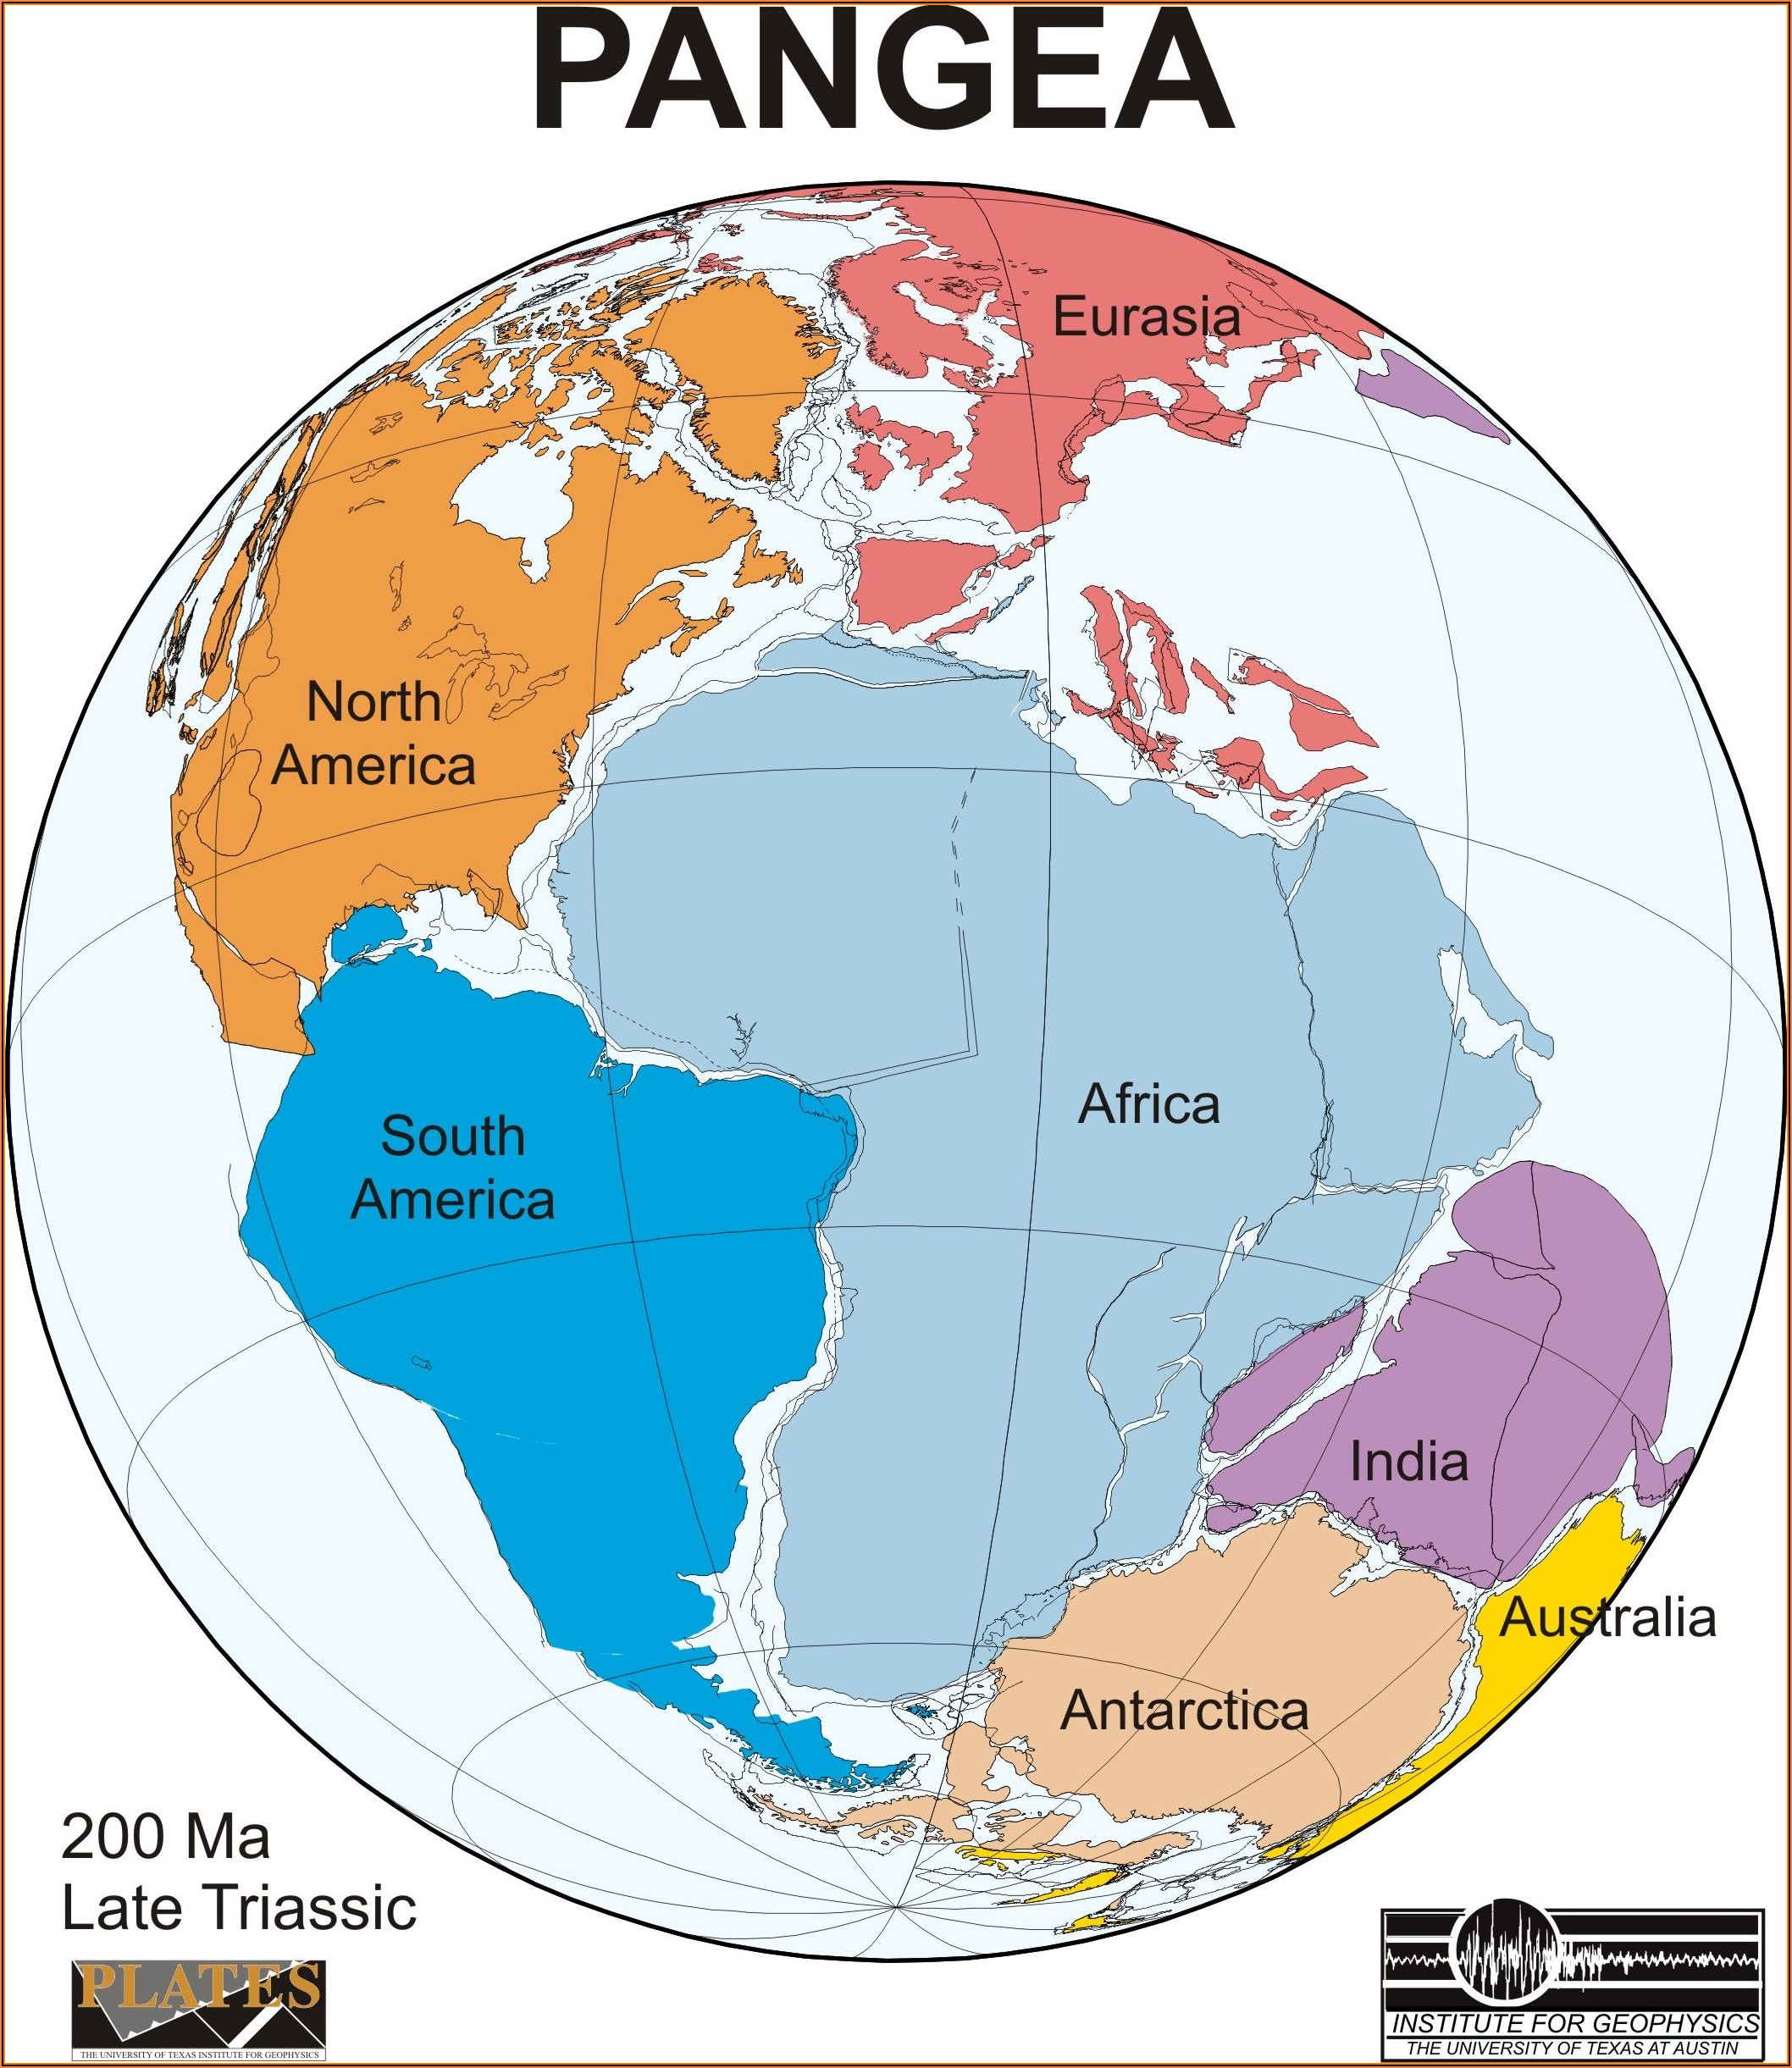 Compare Pangaea With World Map